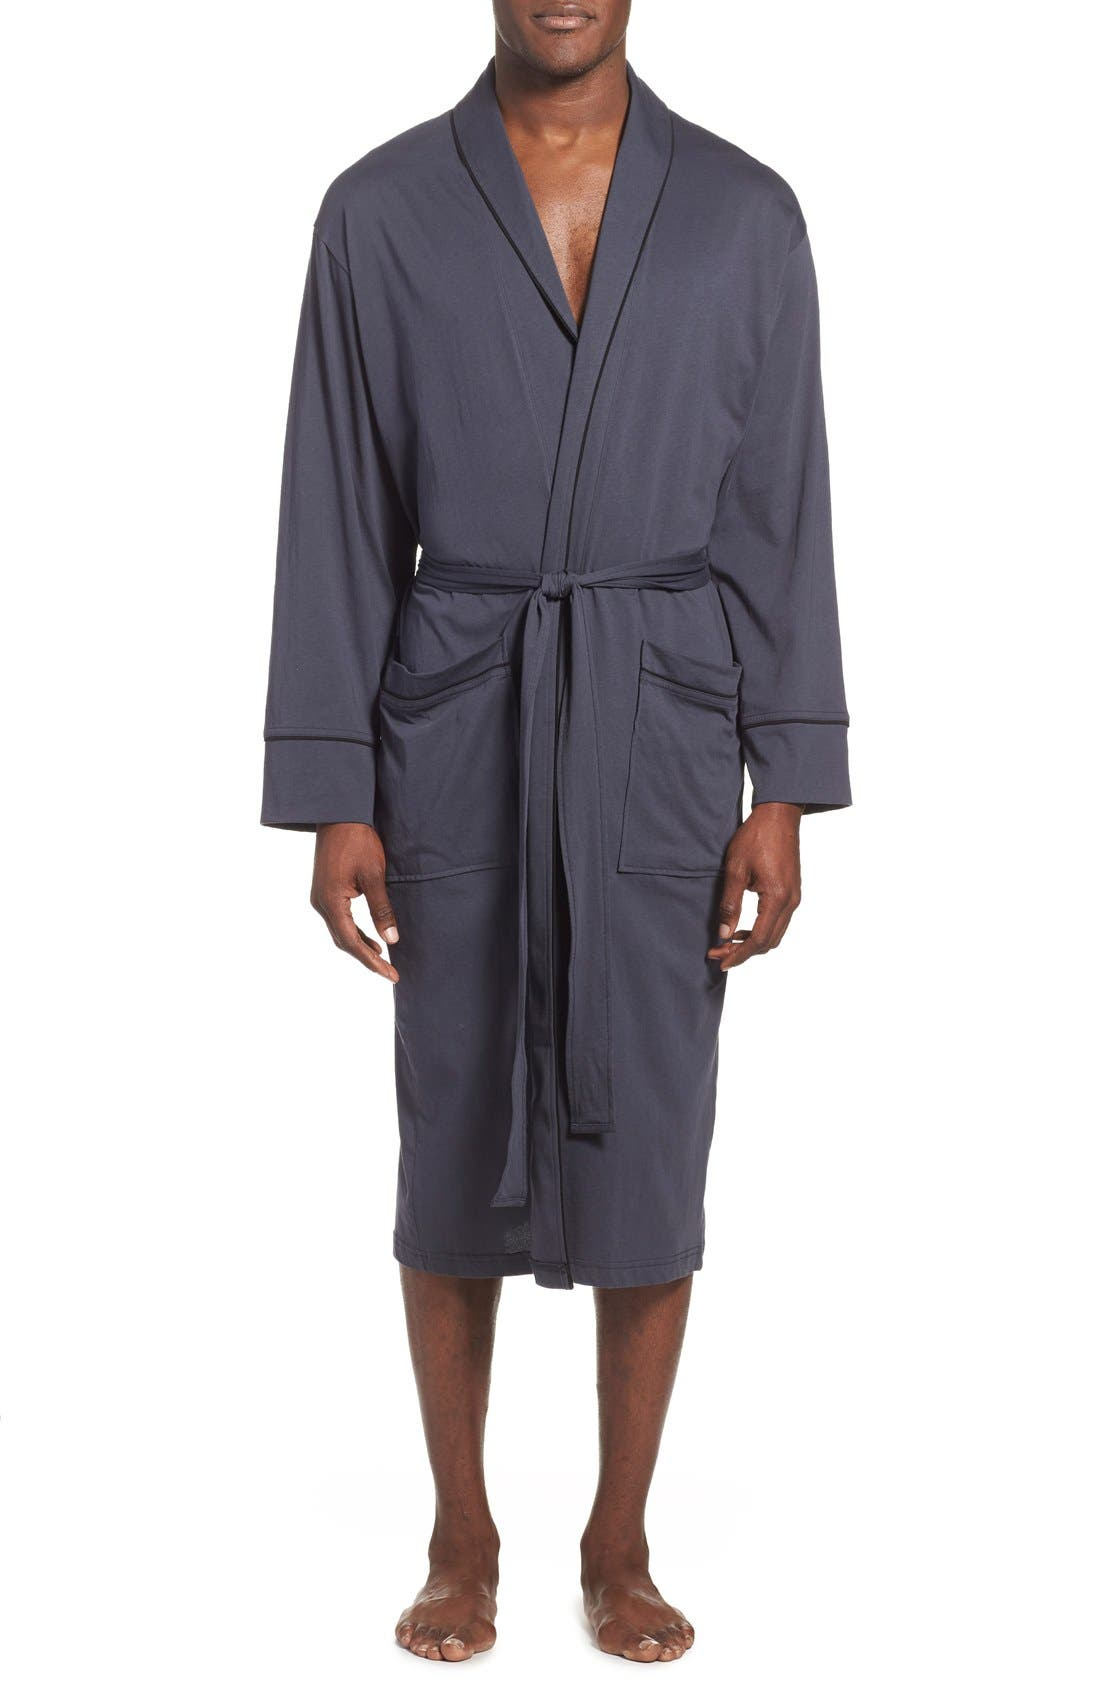 Main Image - Daniel Buchler Peruvian Pima Cotton Robe